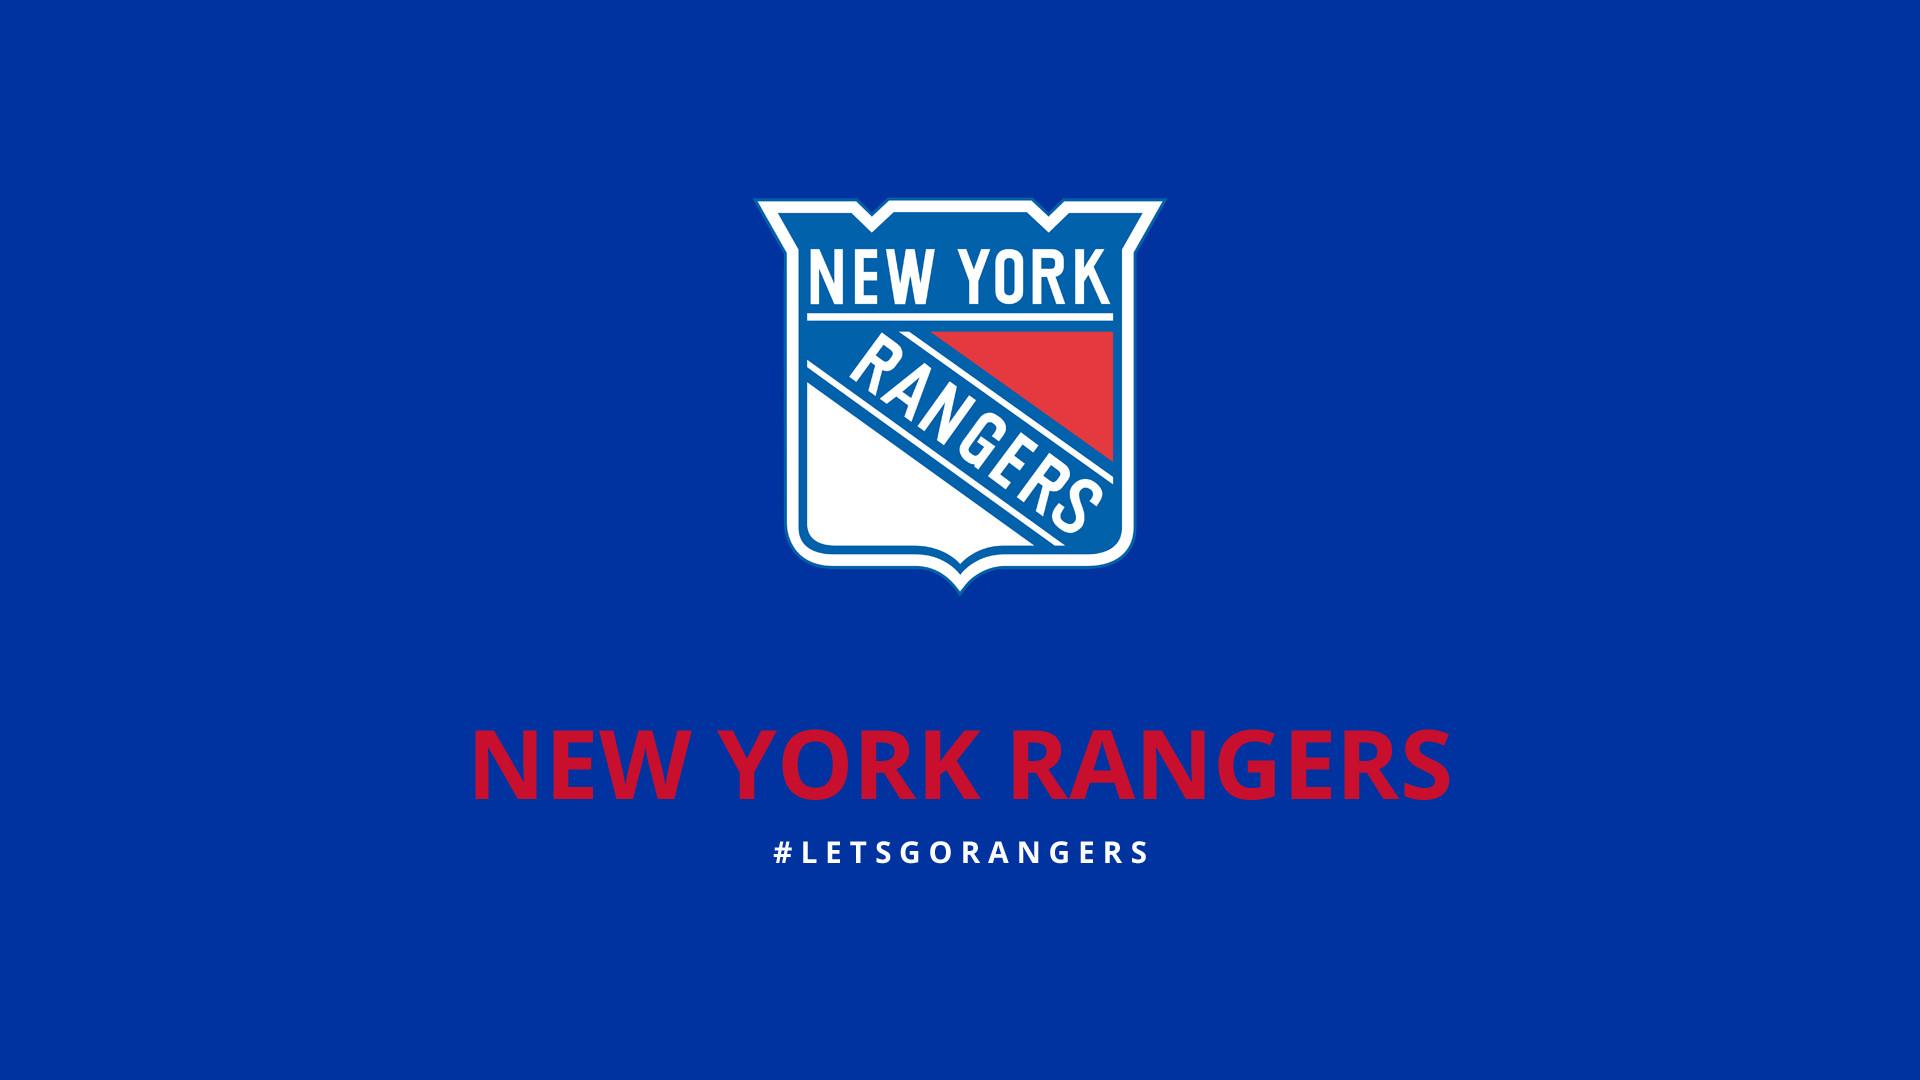 NY Rangers HD Wallpaper by Carlie Palumbo PC.476-KYS